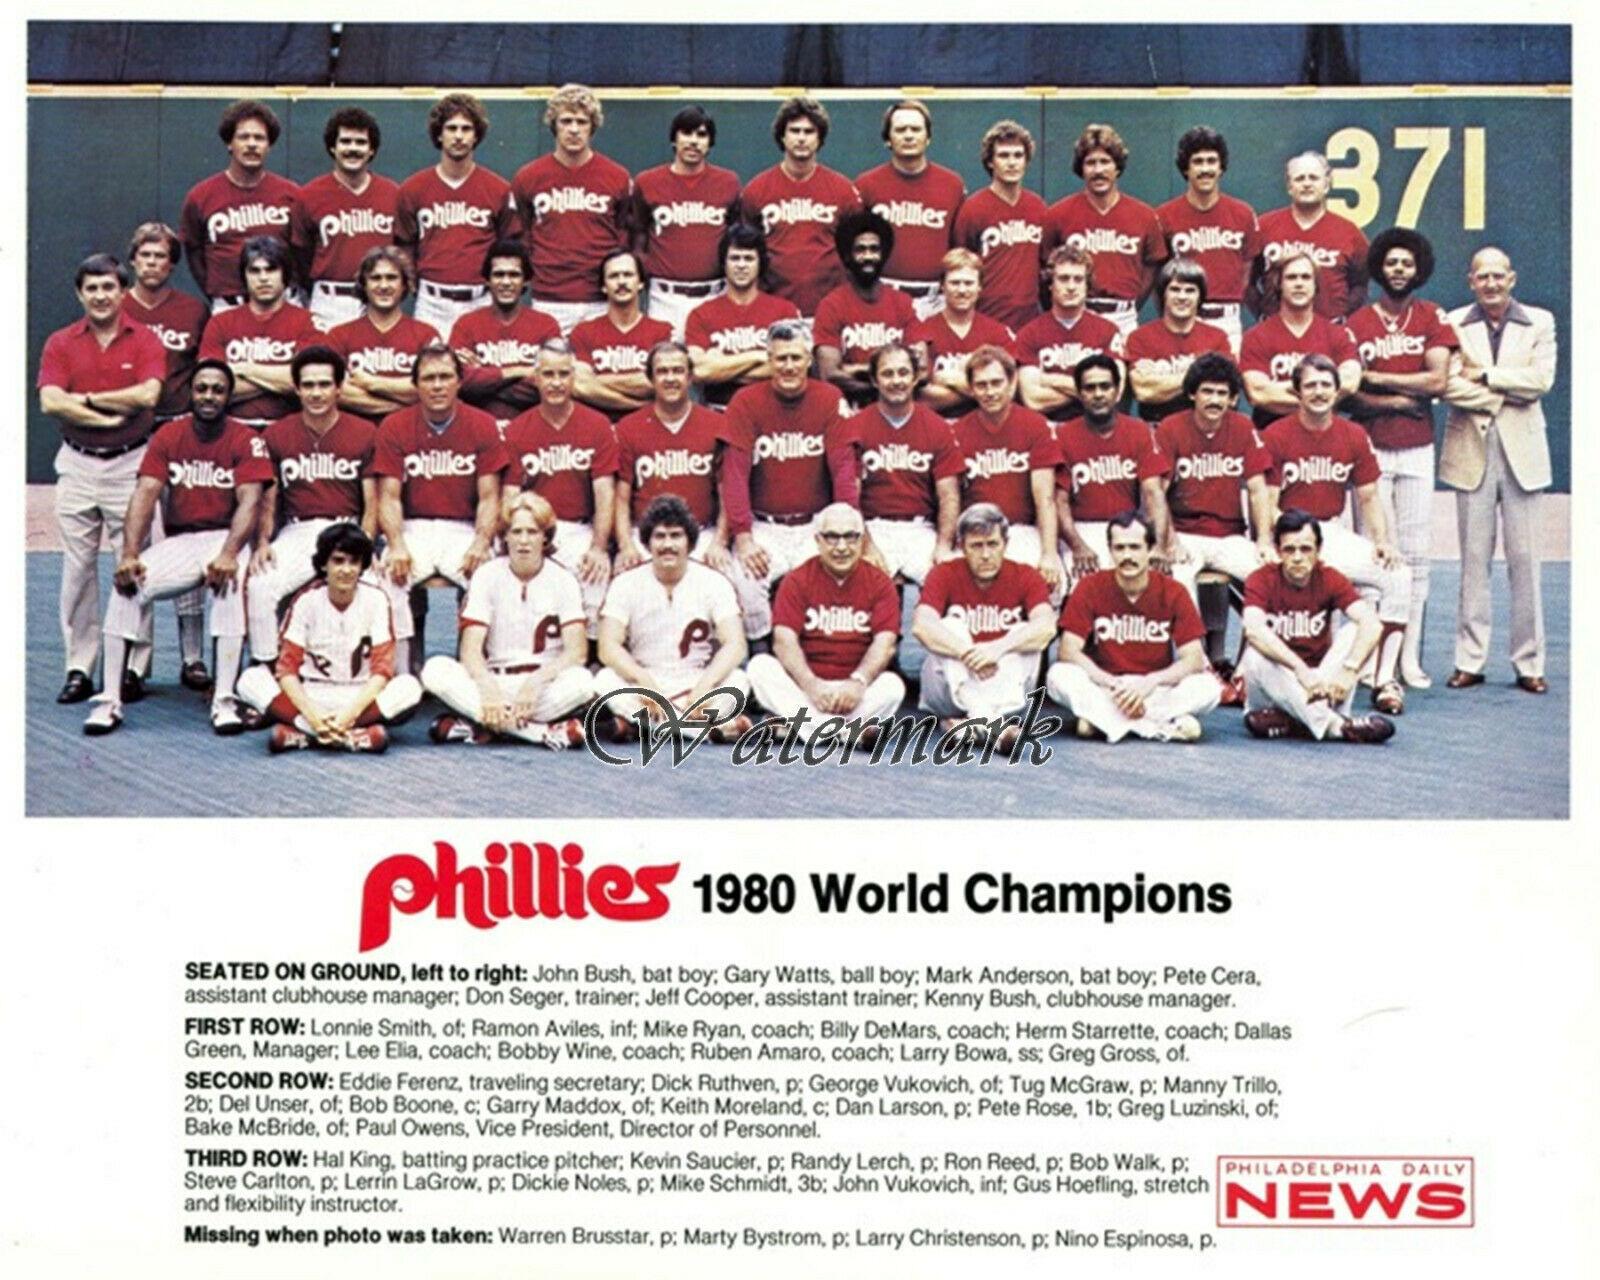 MLB 1980 World Series Champs Philadelphia Phillies Team Picture 8 X 10 Photo Pic - $5.99